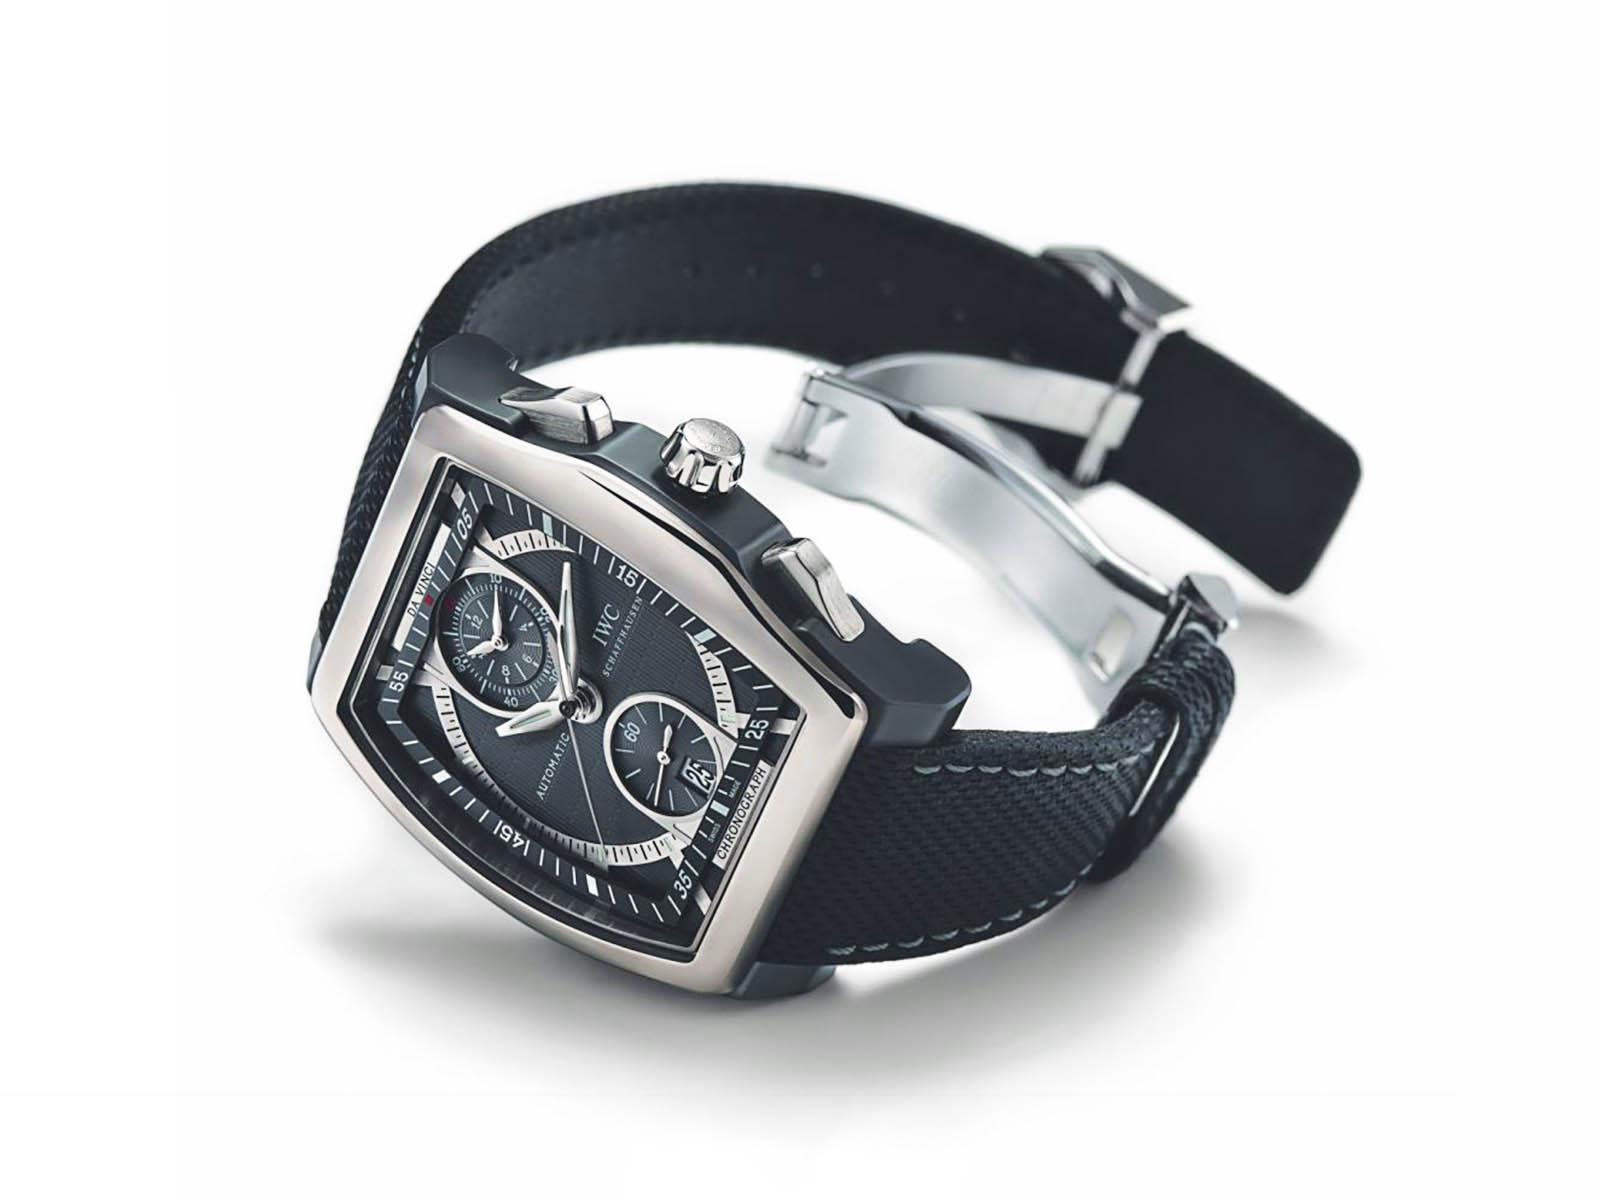 iw3766-iwc-da-vinci-chronograph-ceramic.jpg